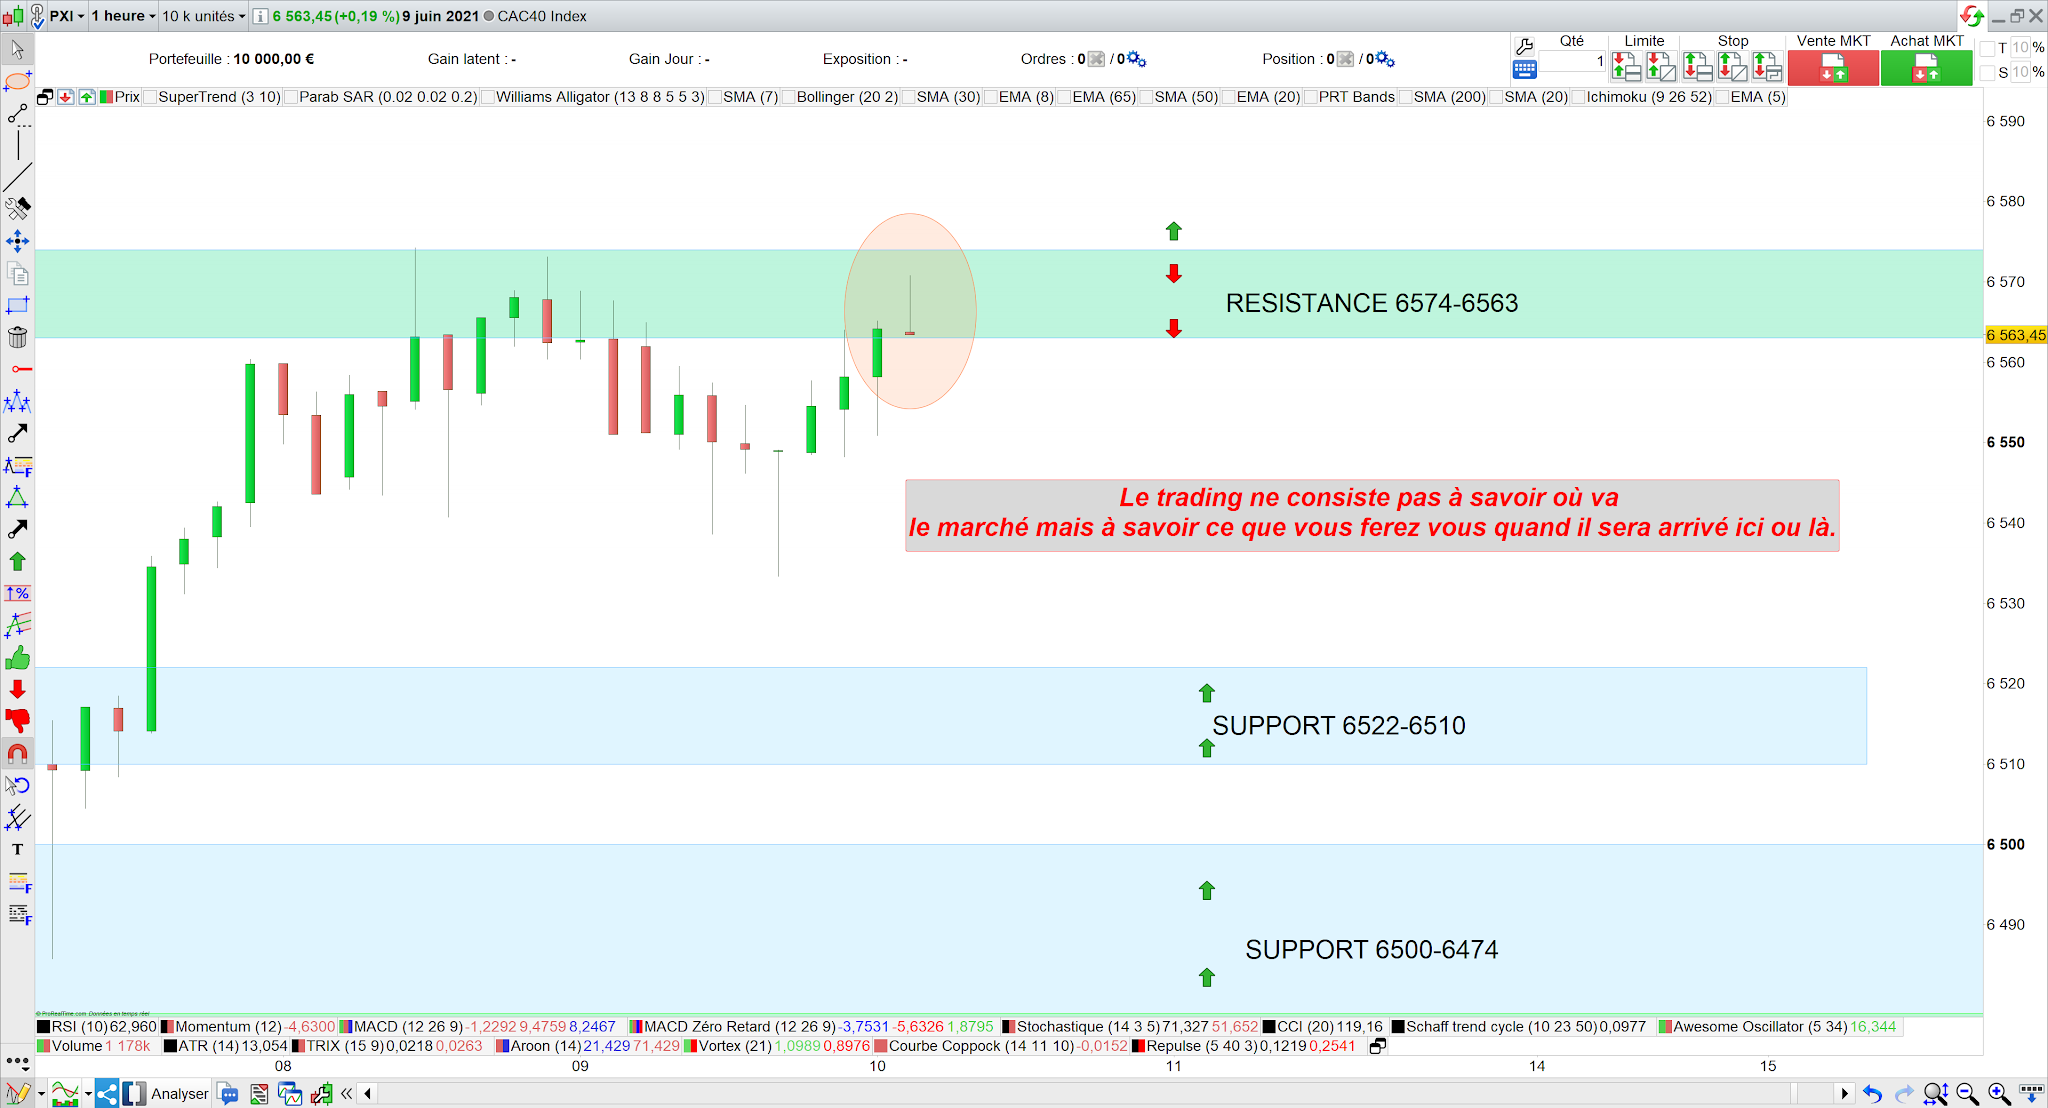 Trading cac40 10 juin 21